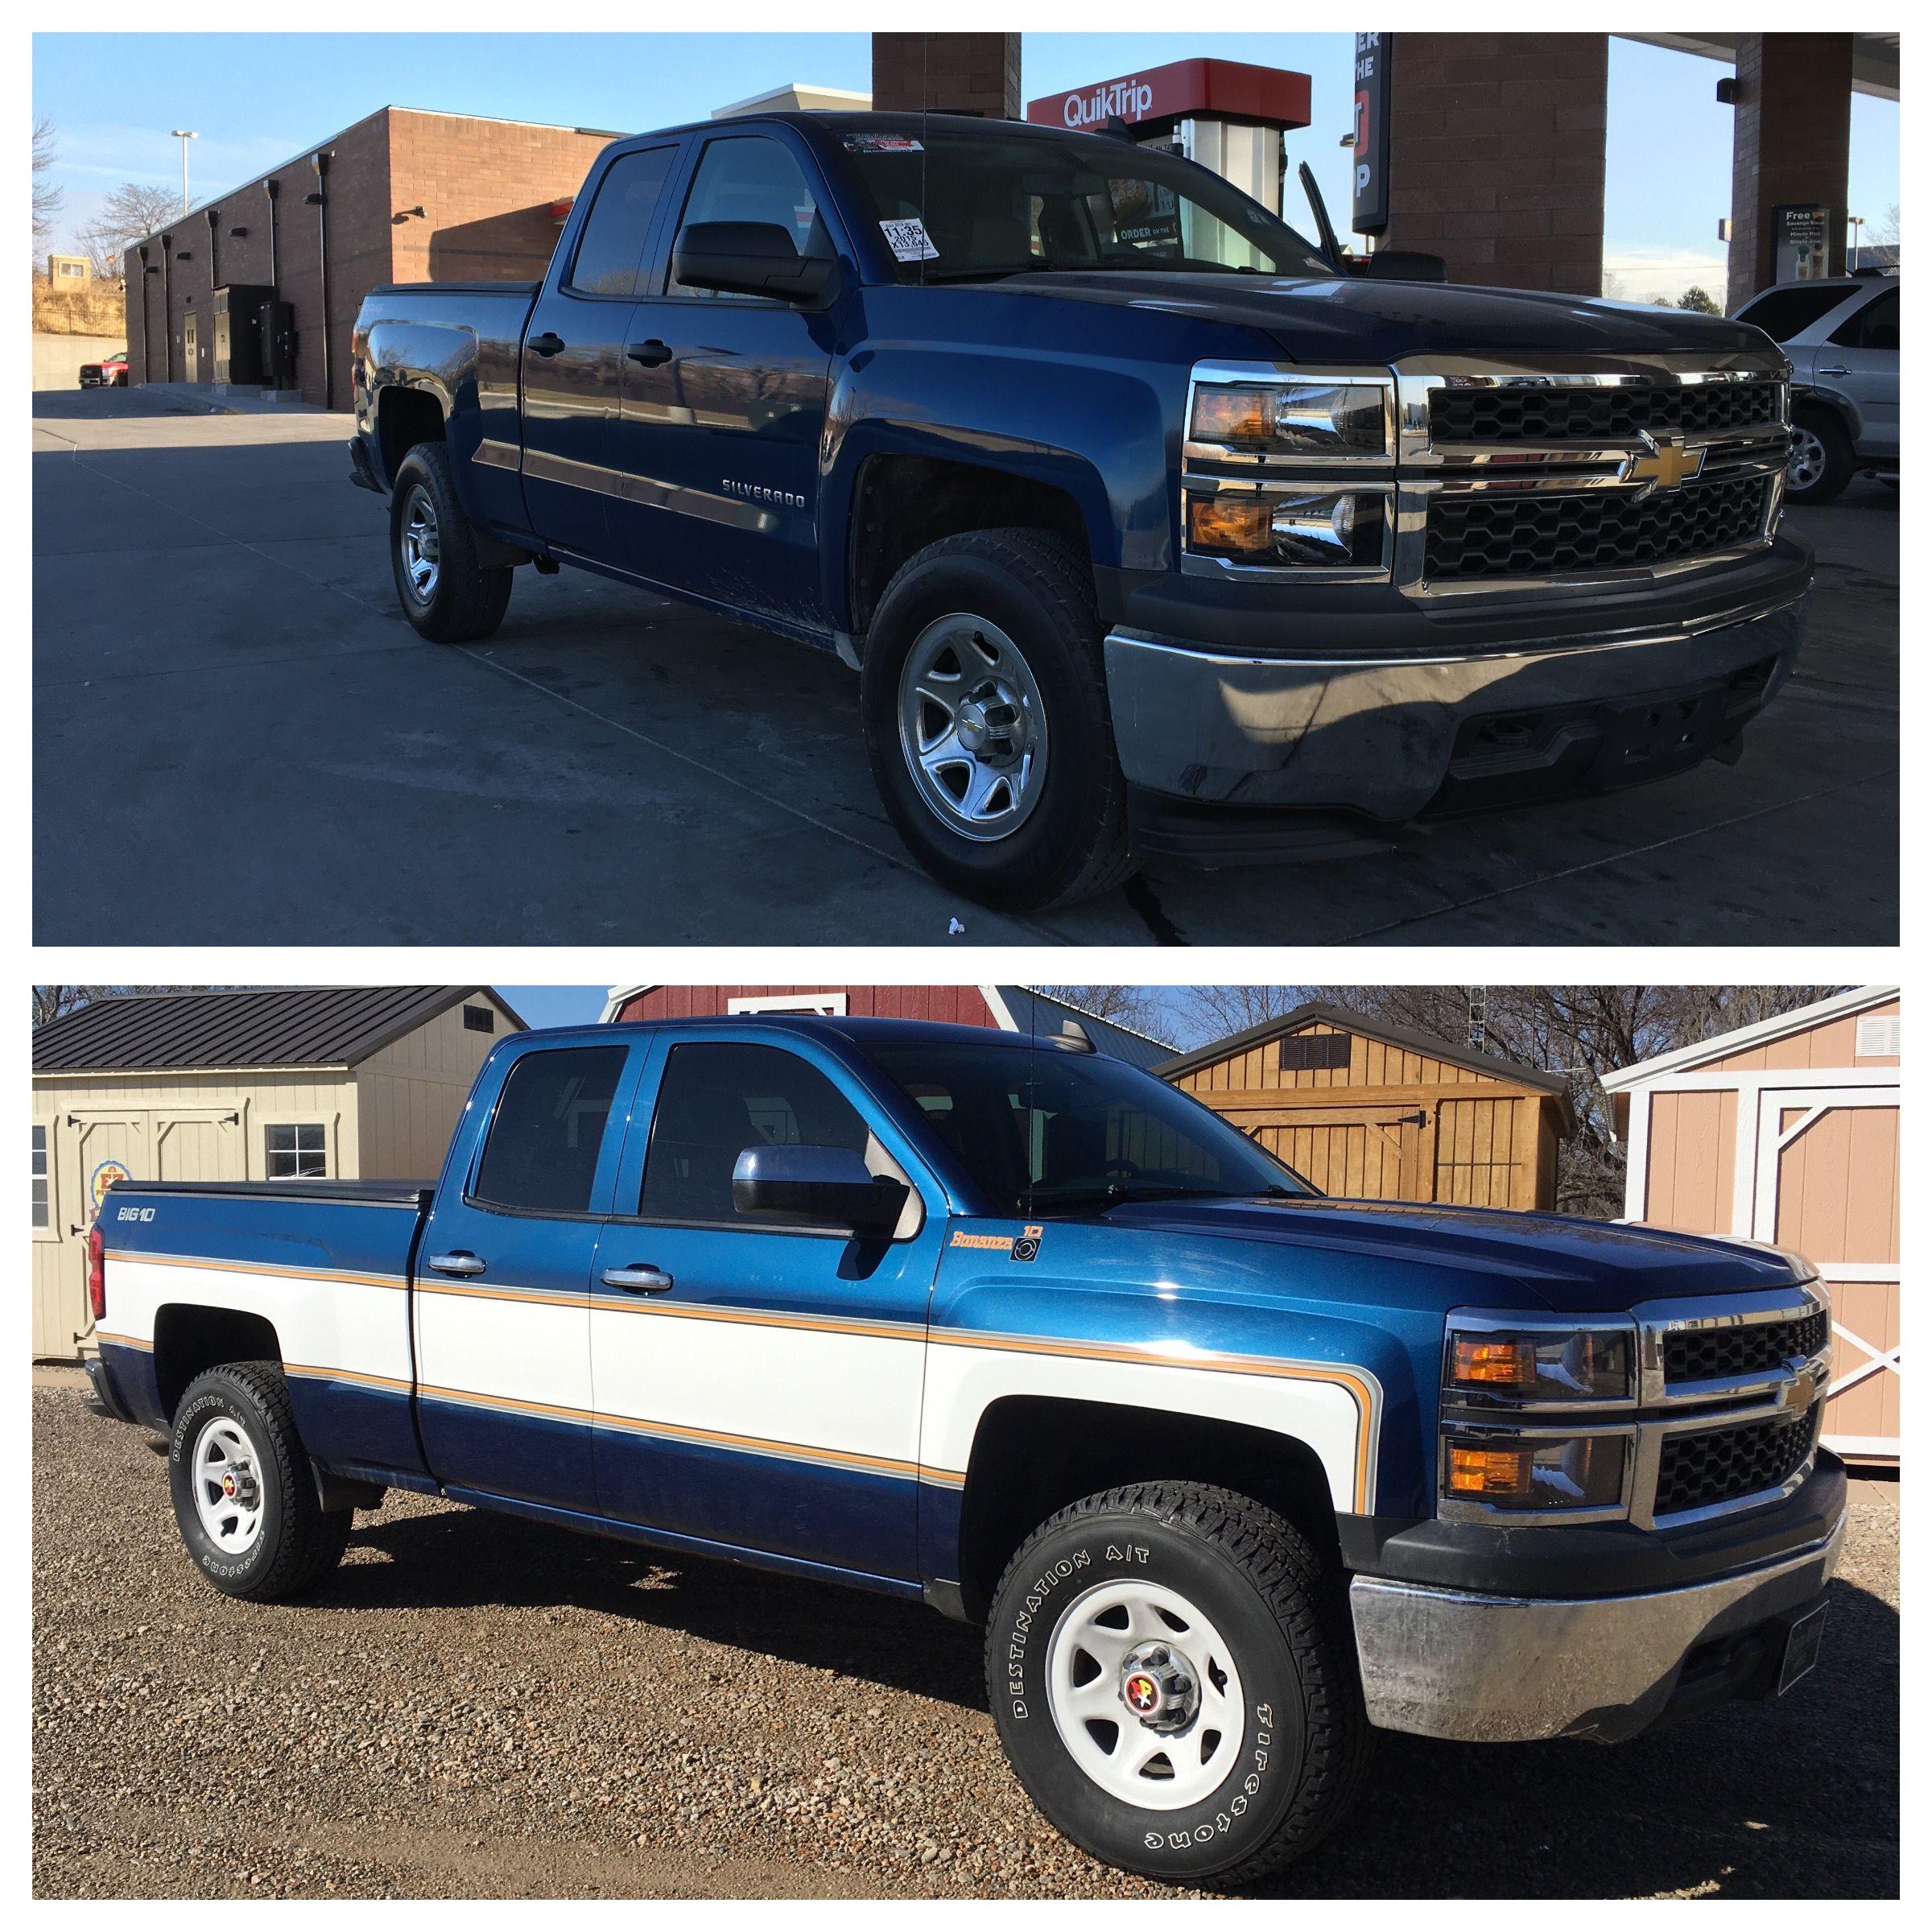 2017 Silverado 1500 Chevrolet Trucks Gmc